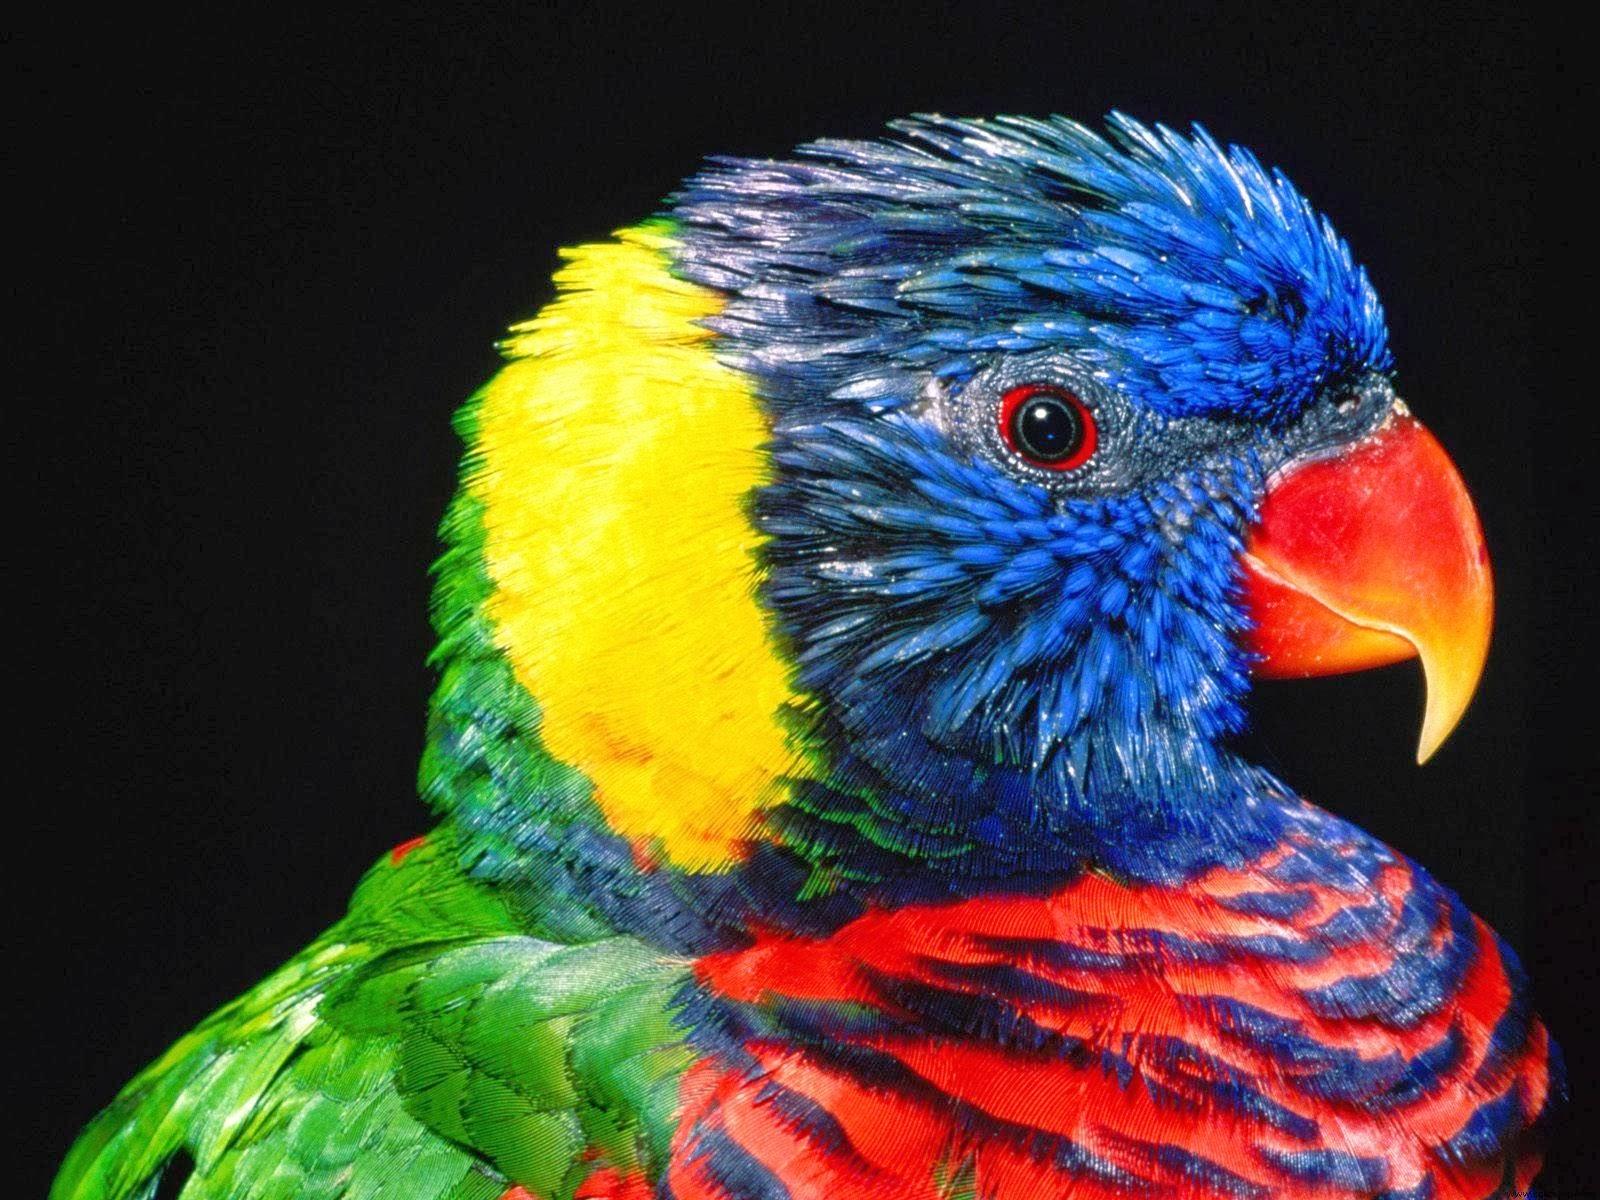 A Beautiful Couple Of Lorikeet Birds Wallpaper Hd: Lorikeet Bird